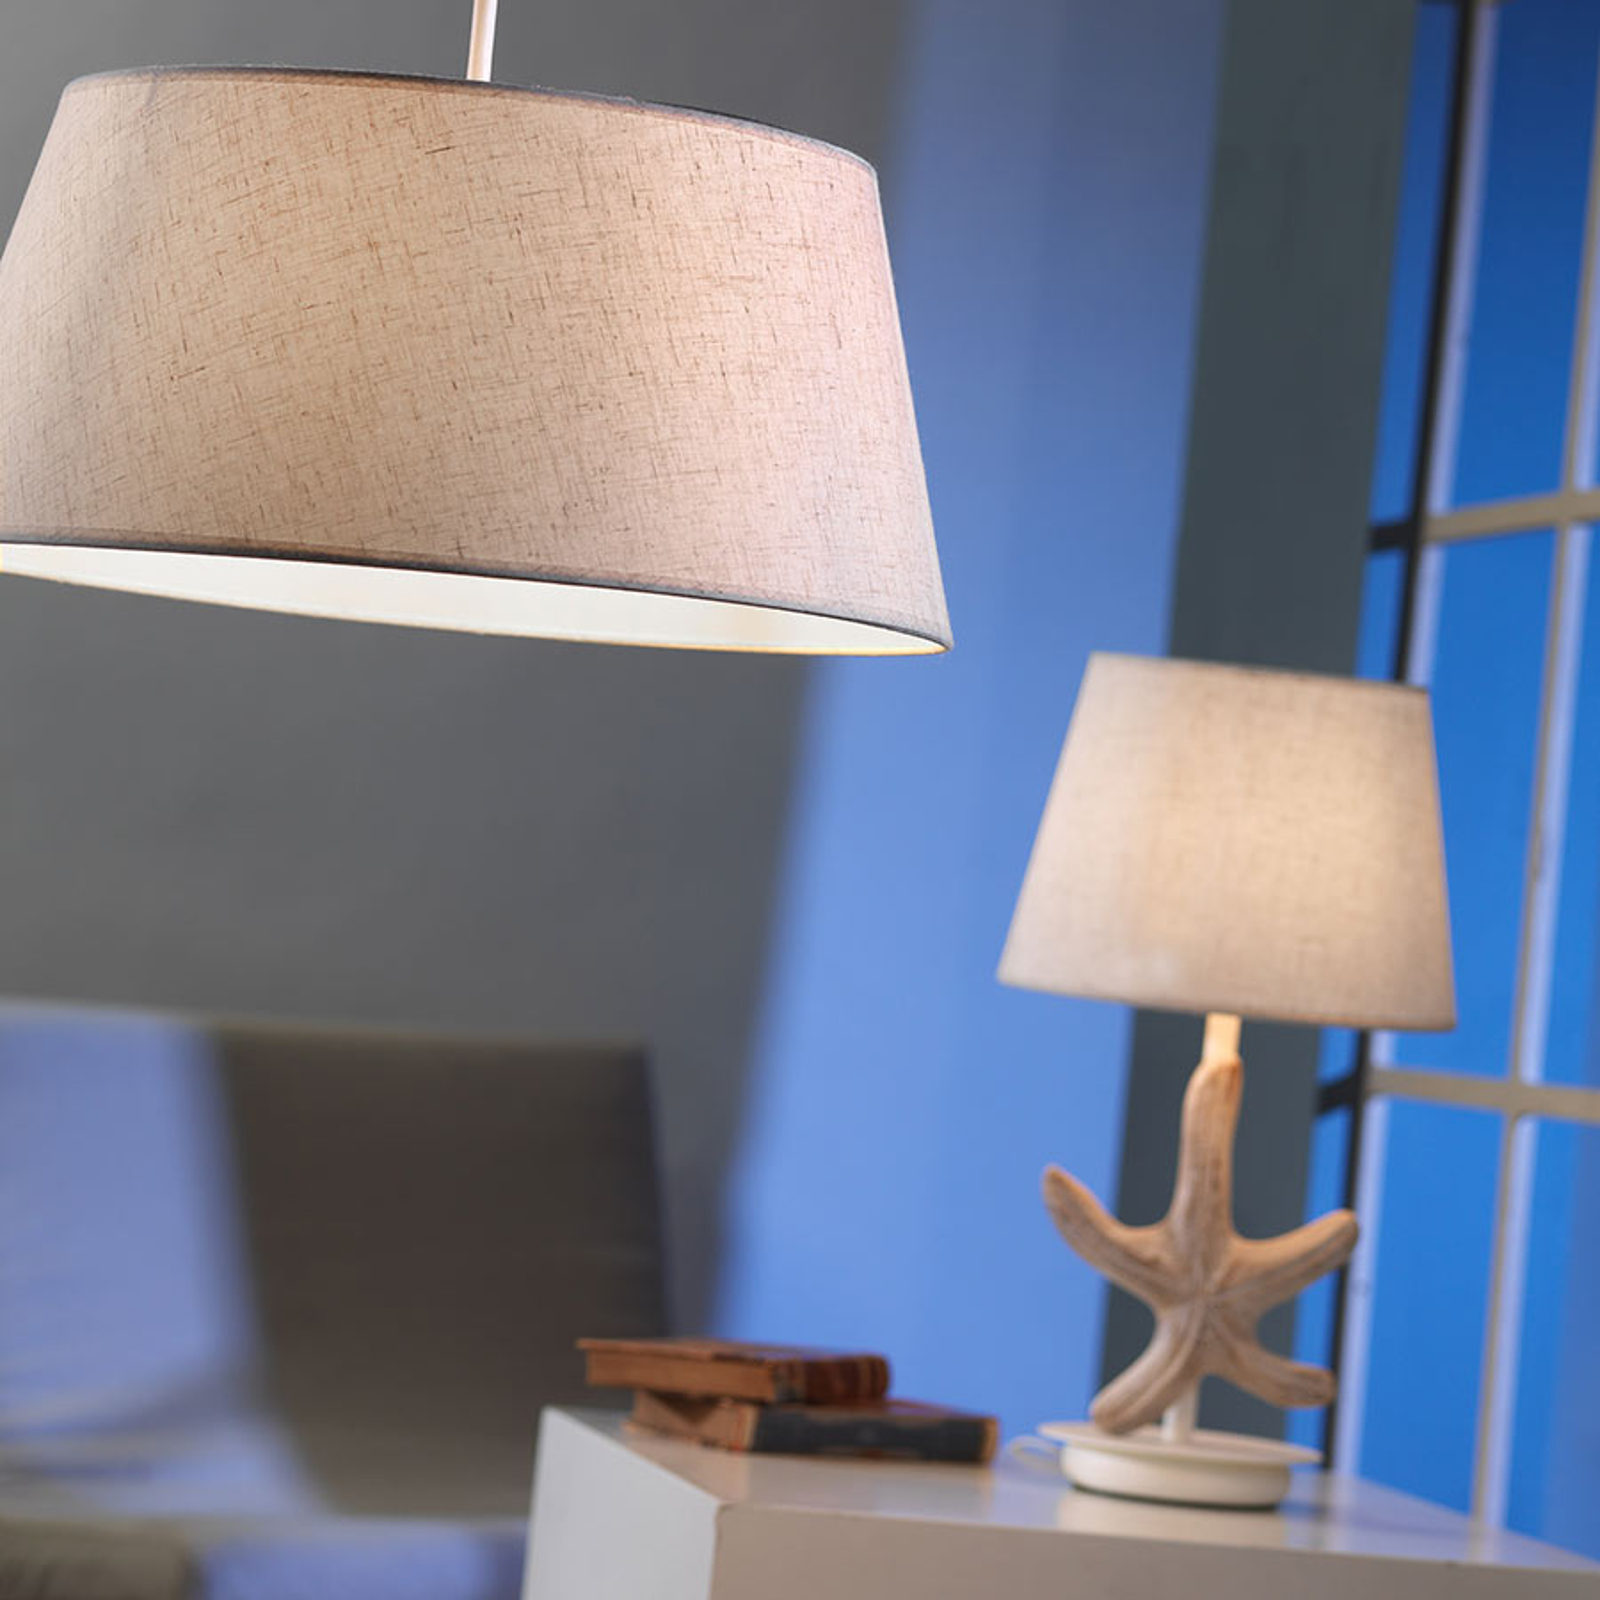 Tafellamp Stellina, stoffen kap, zeester-decoratie